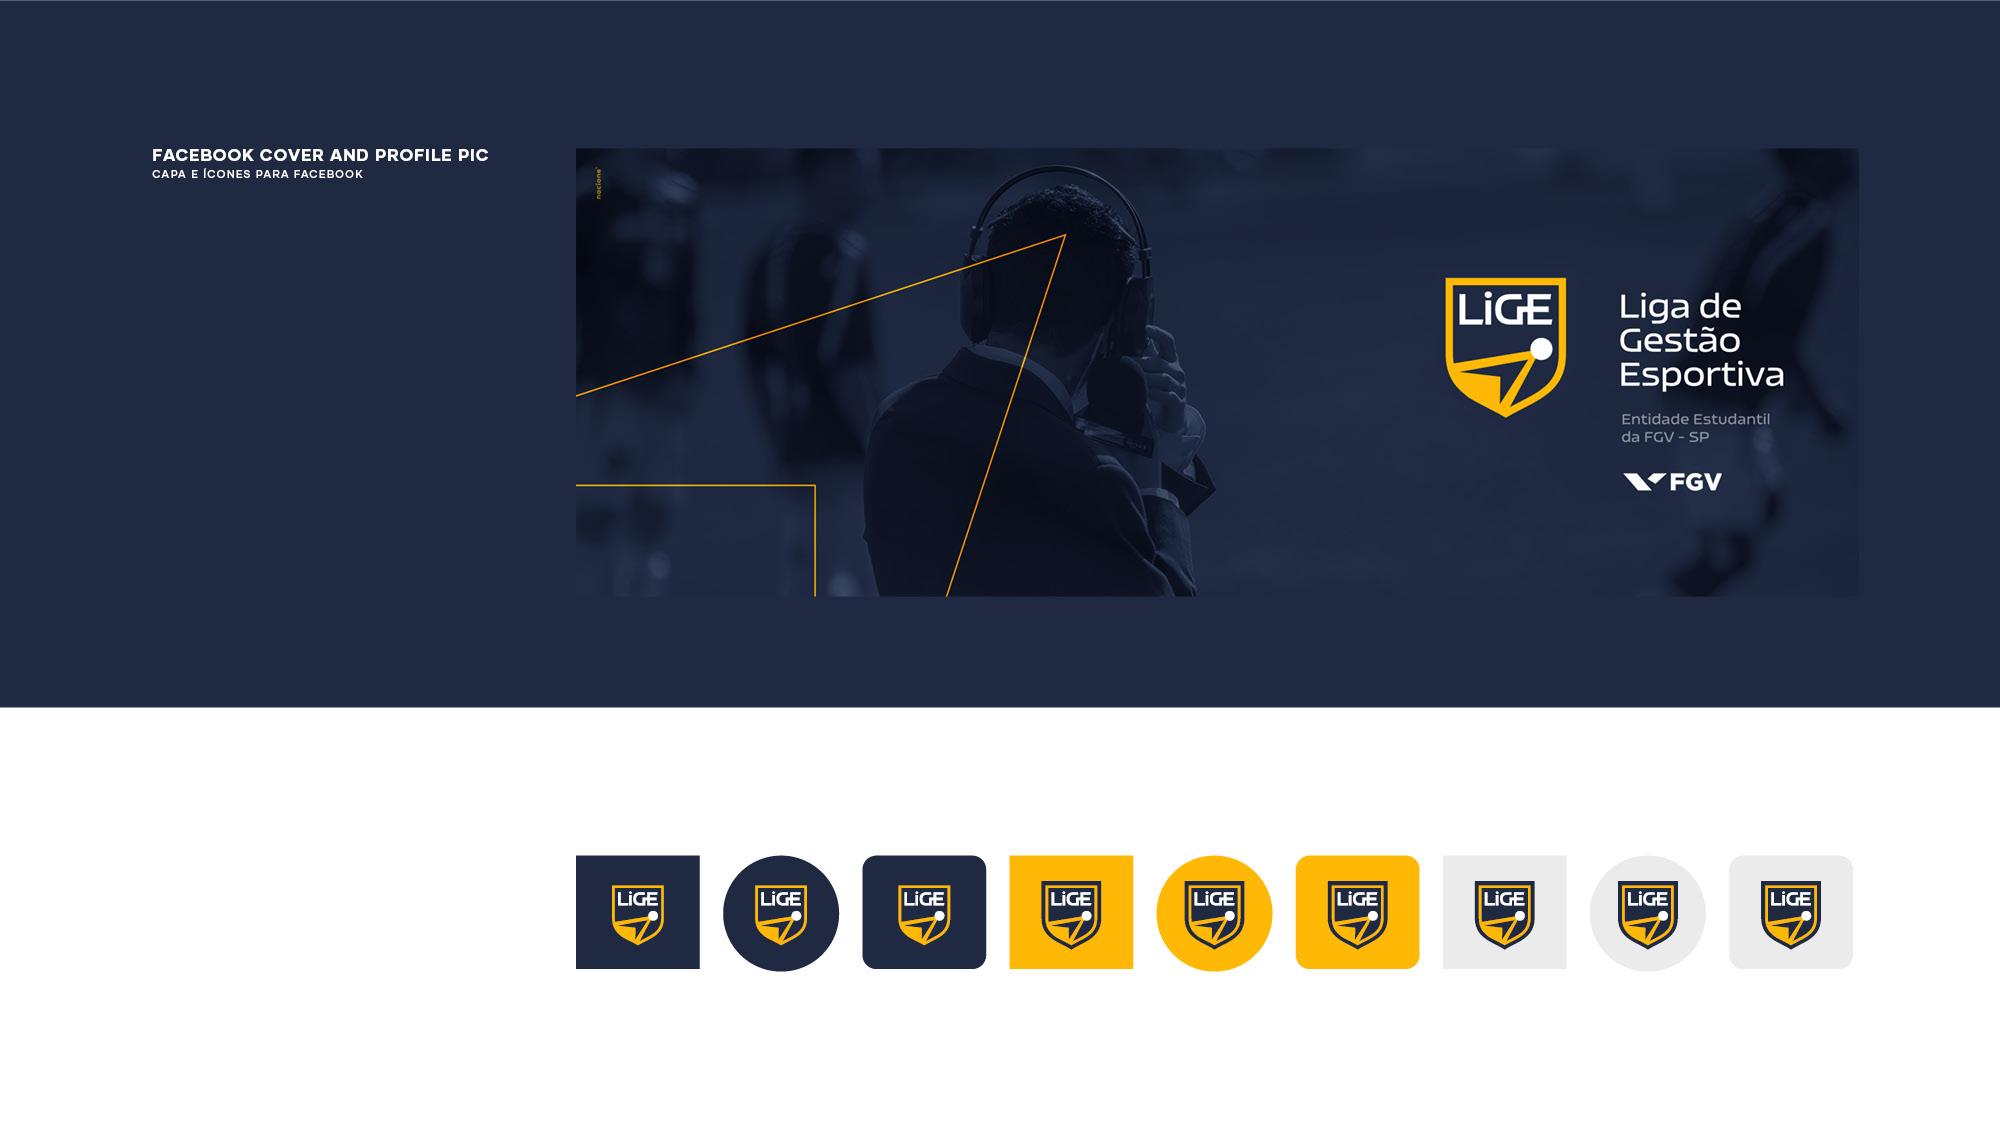 Lige-FGV-SP-Nacione-Branding10